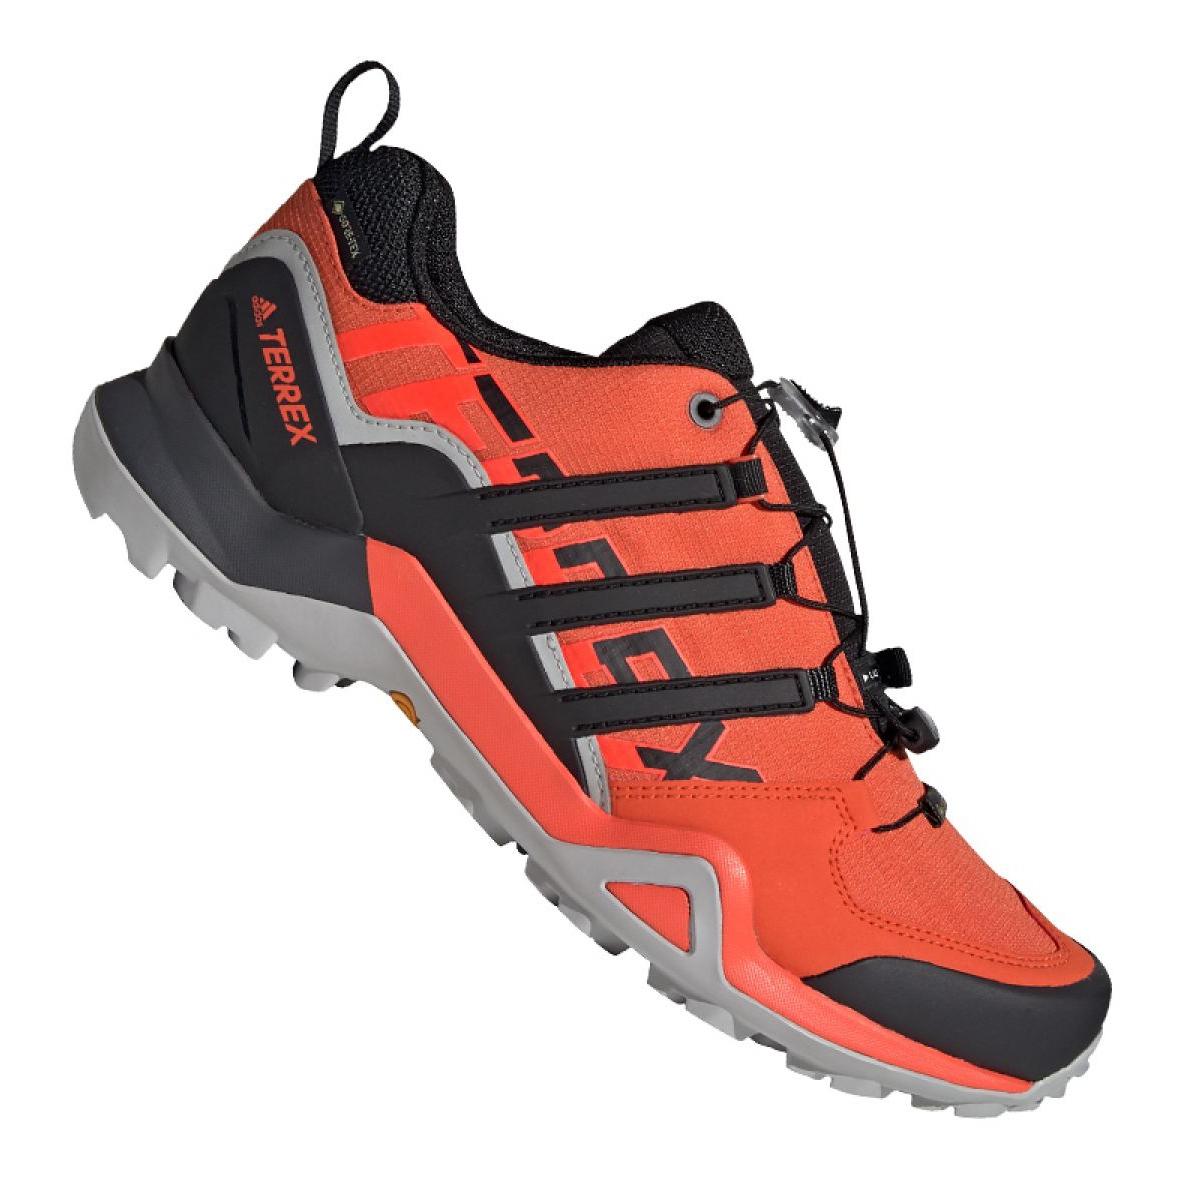 Adidas Terrex Swift R2 Gtx M EH2276